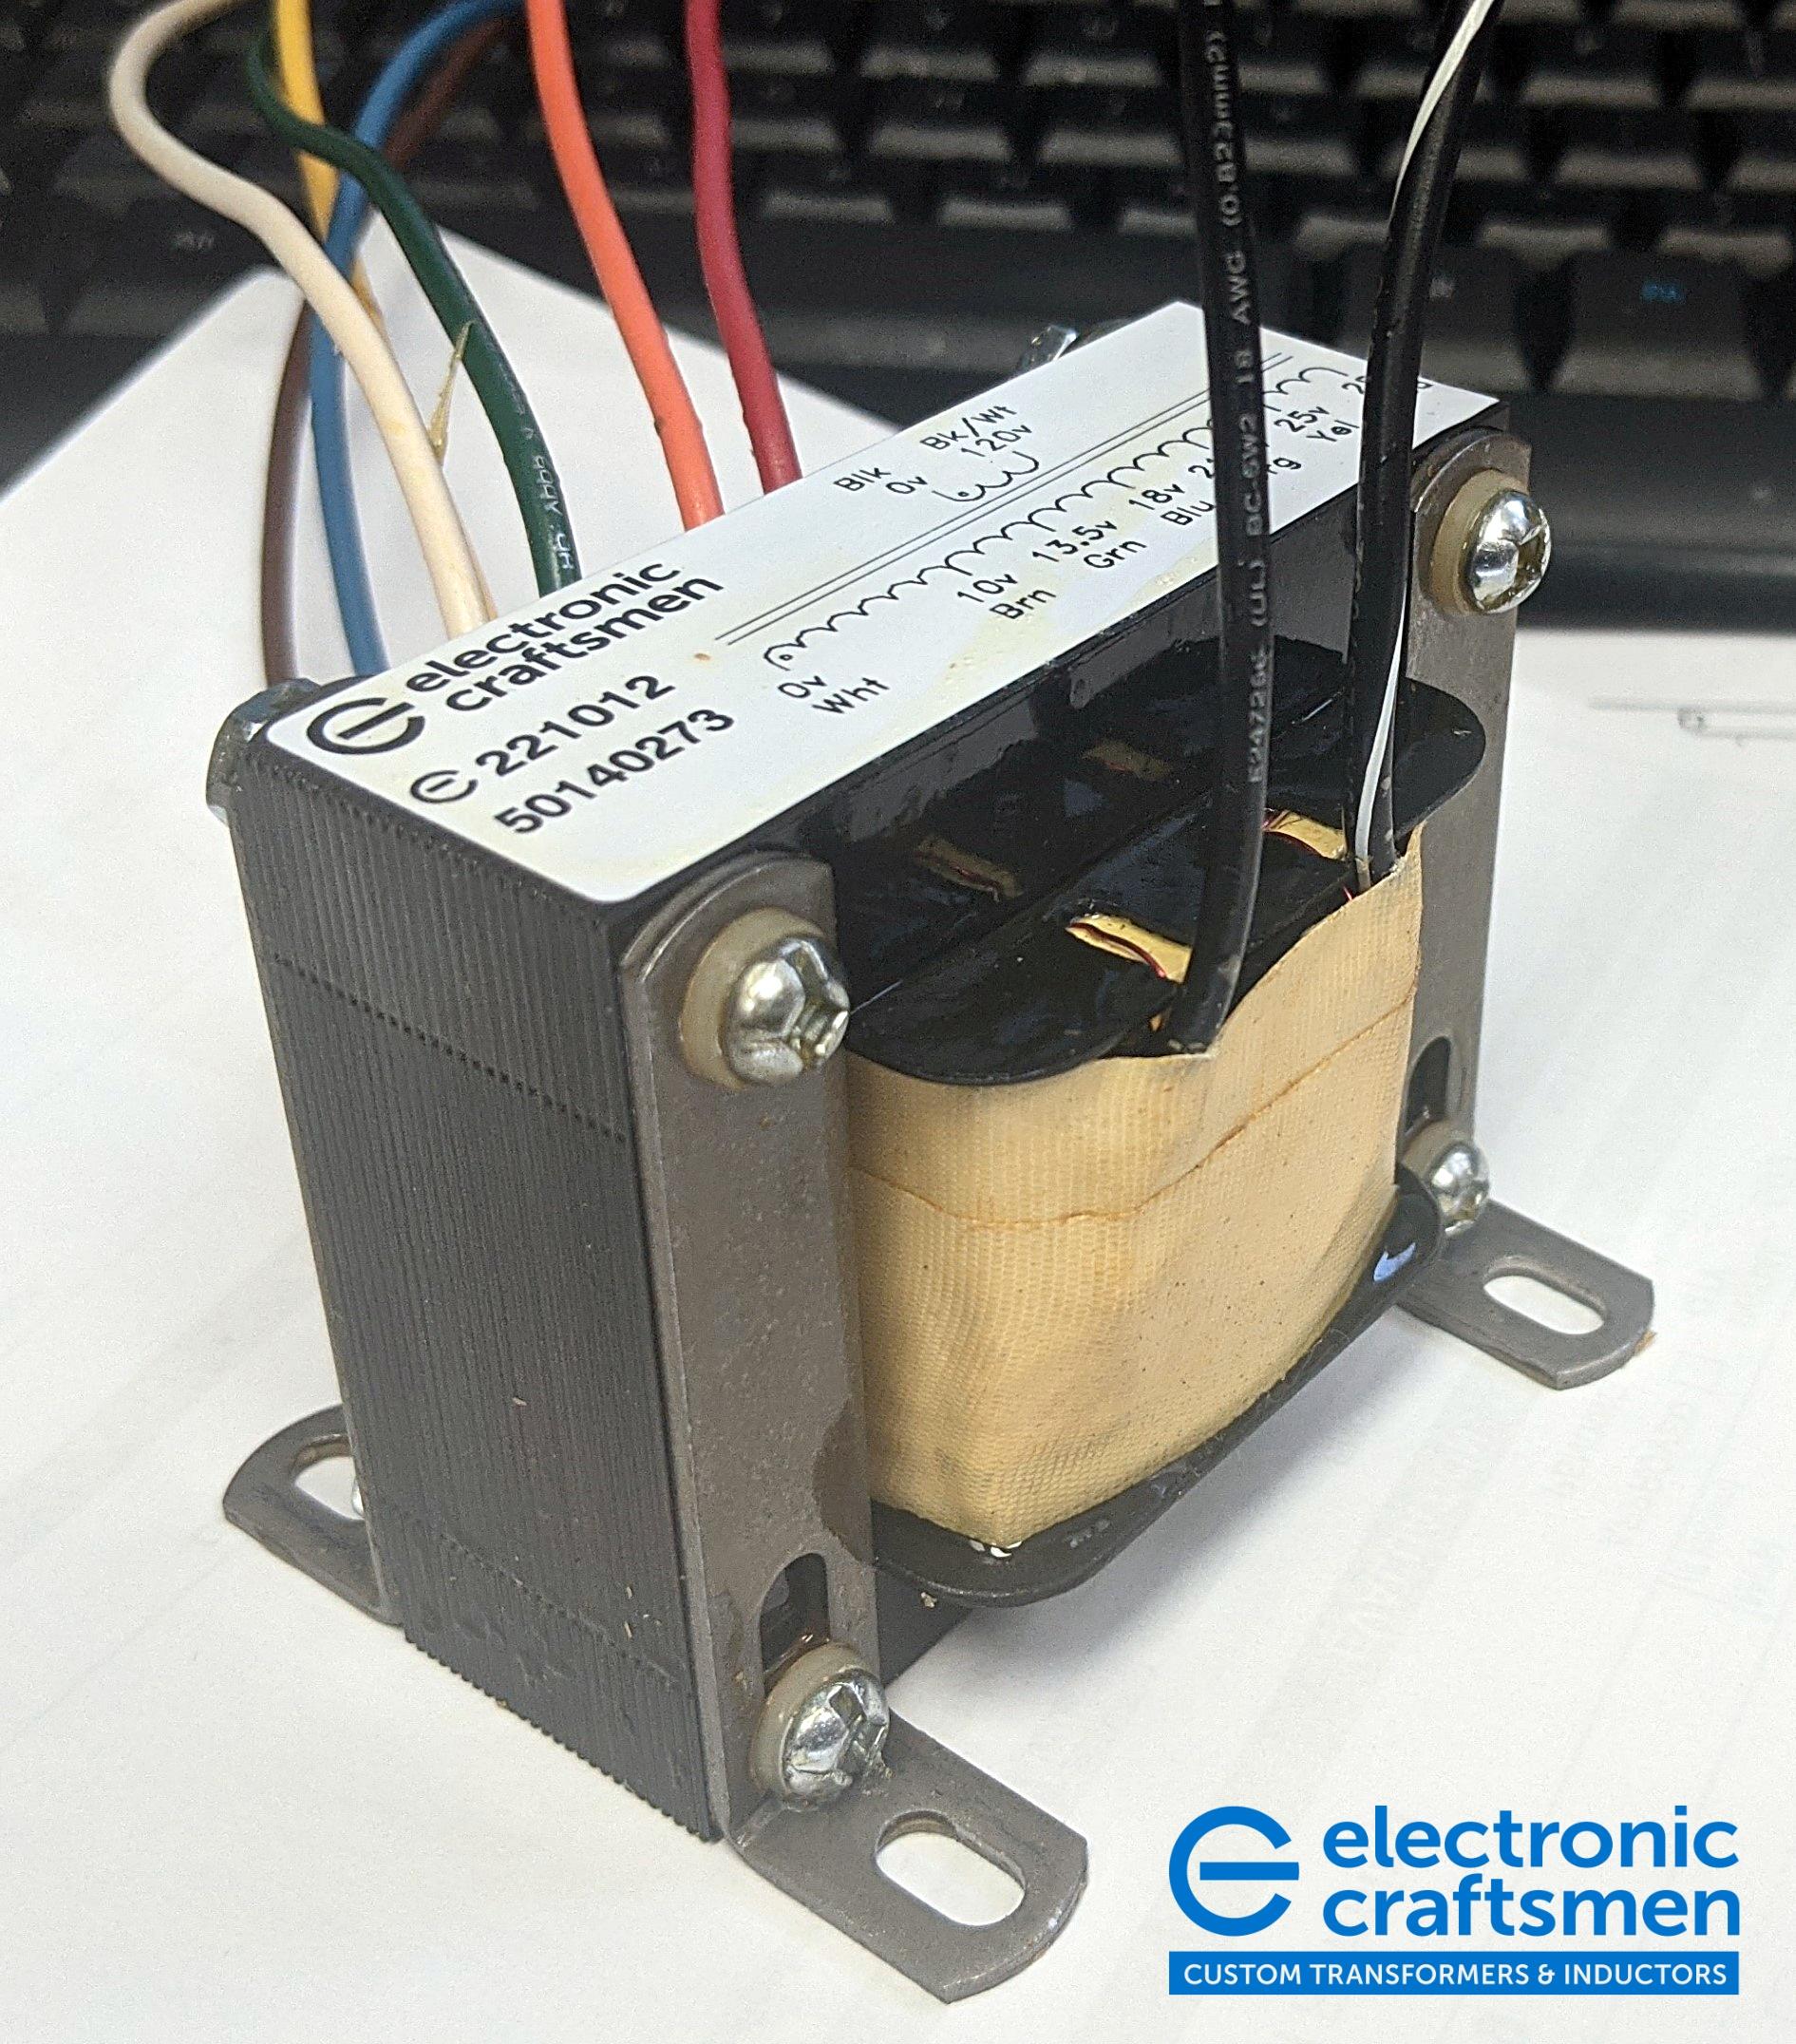 Transformer image